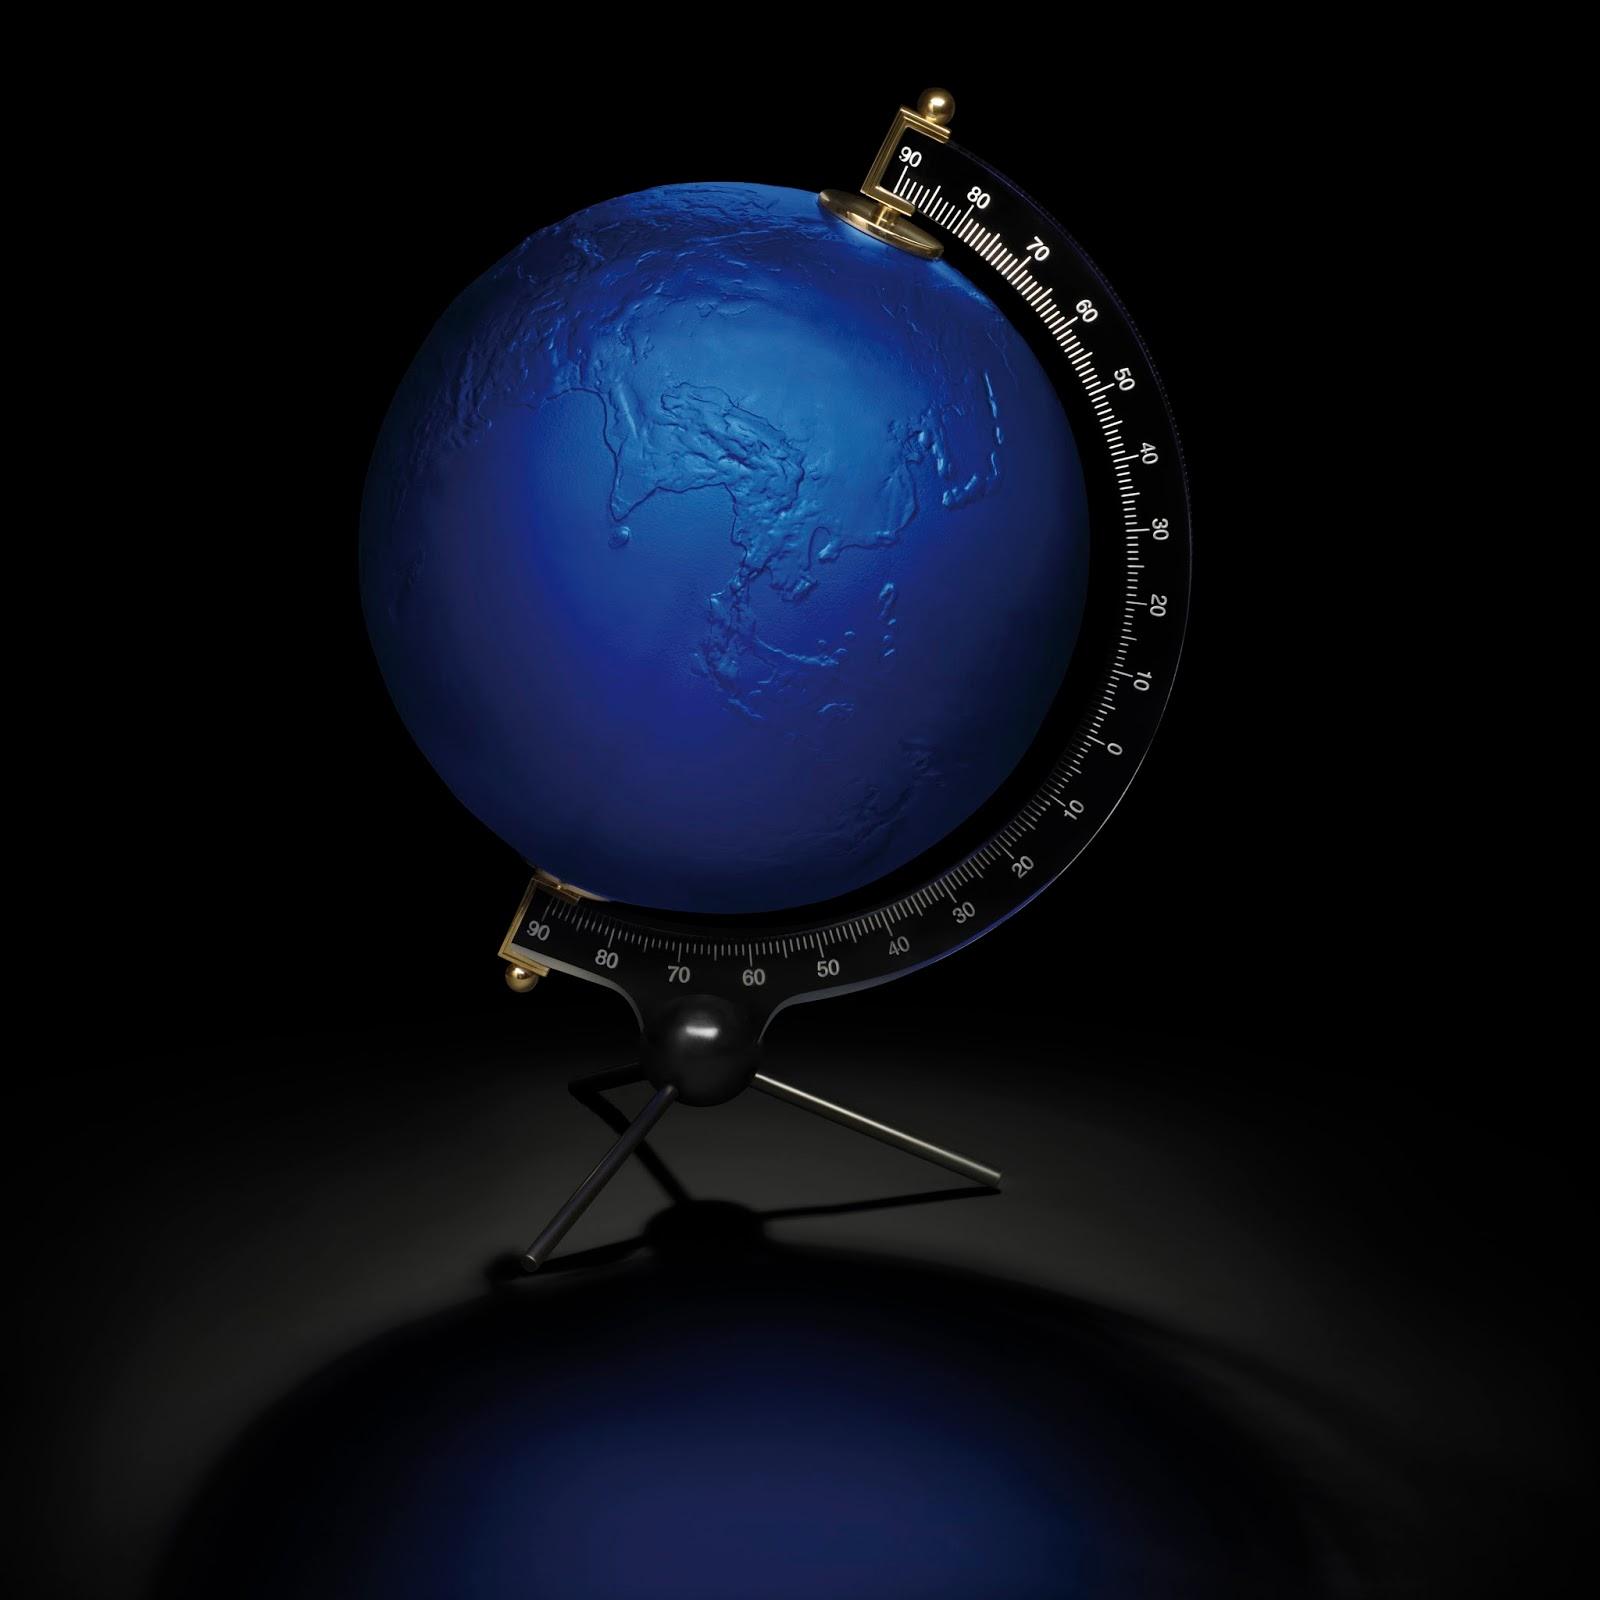 luxury4men yves klein by lalique la terre bleue. Black Bedroom Furniture Sets. Home Design Ideas